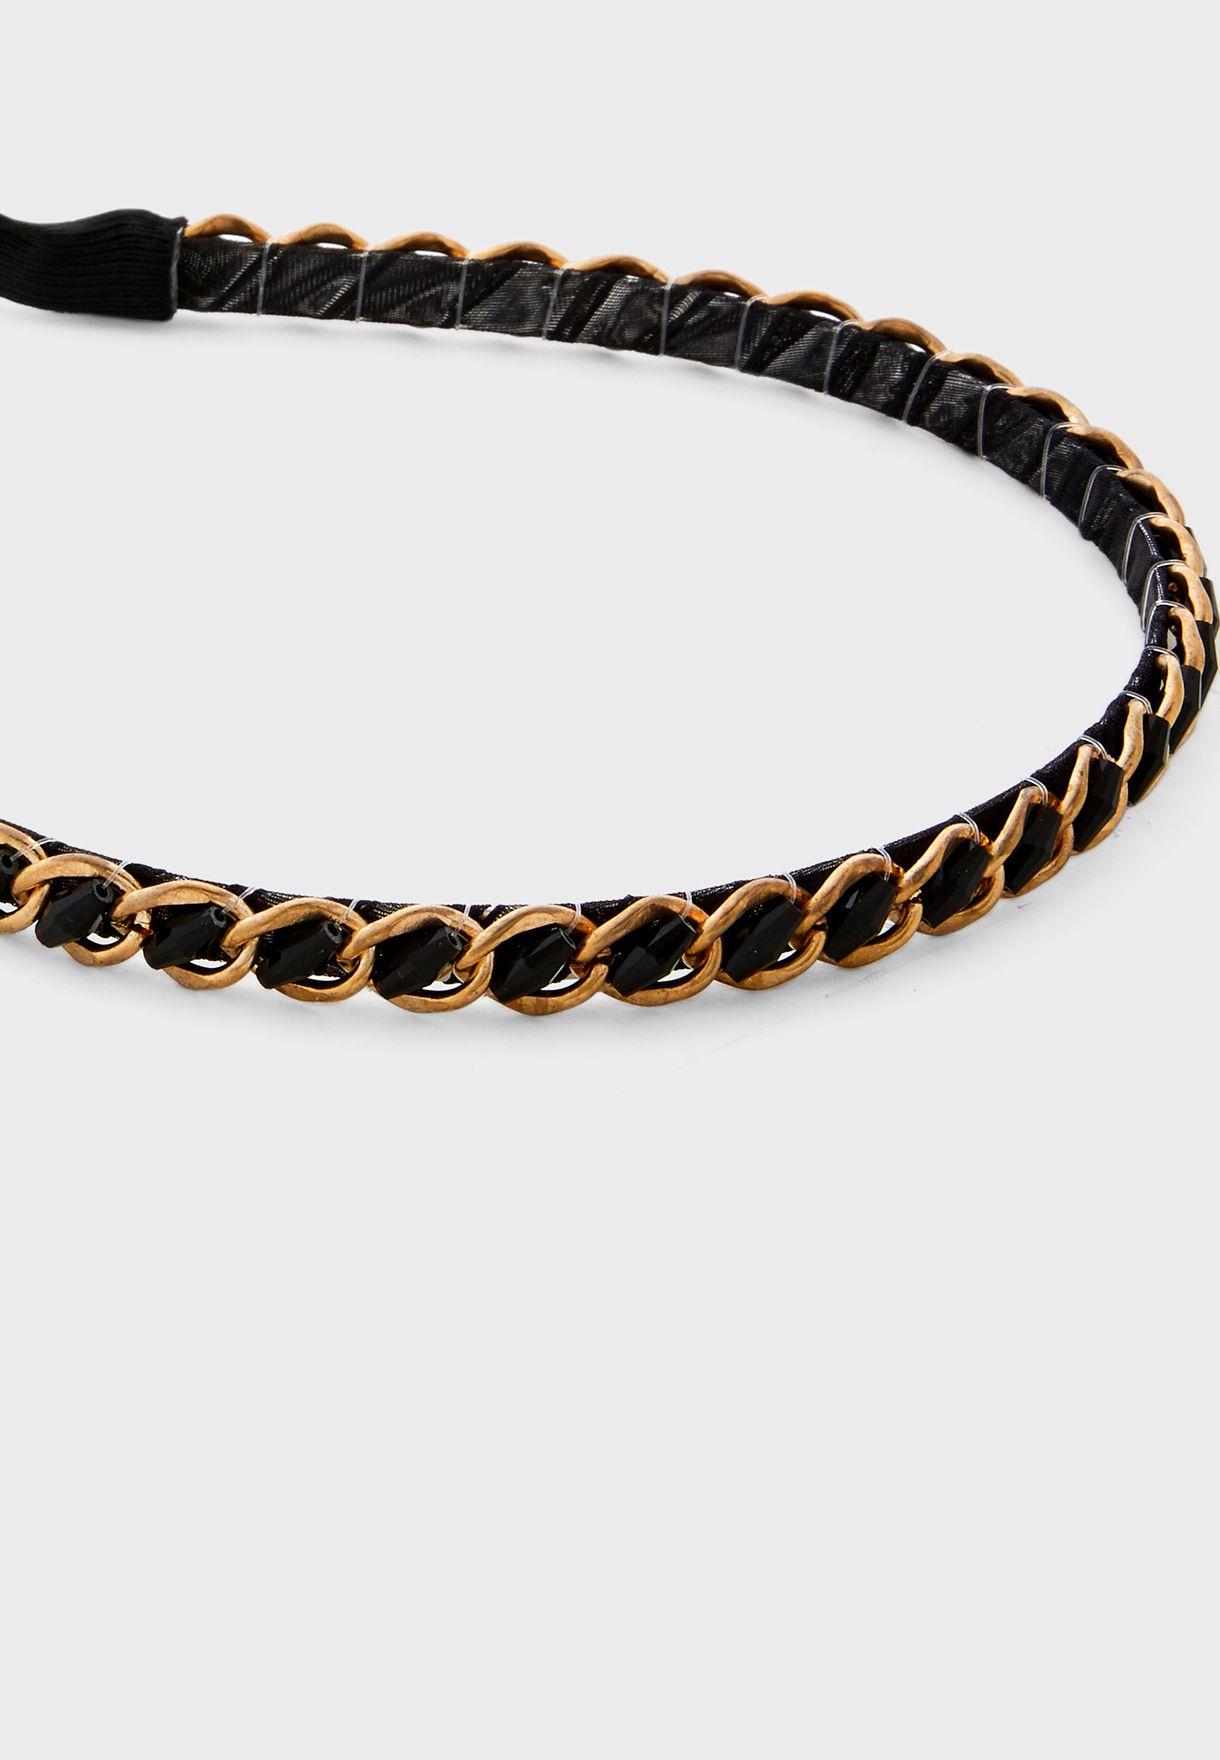 Chain Detail Skinny Headband